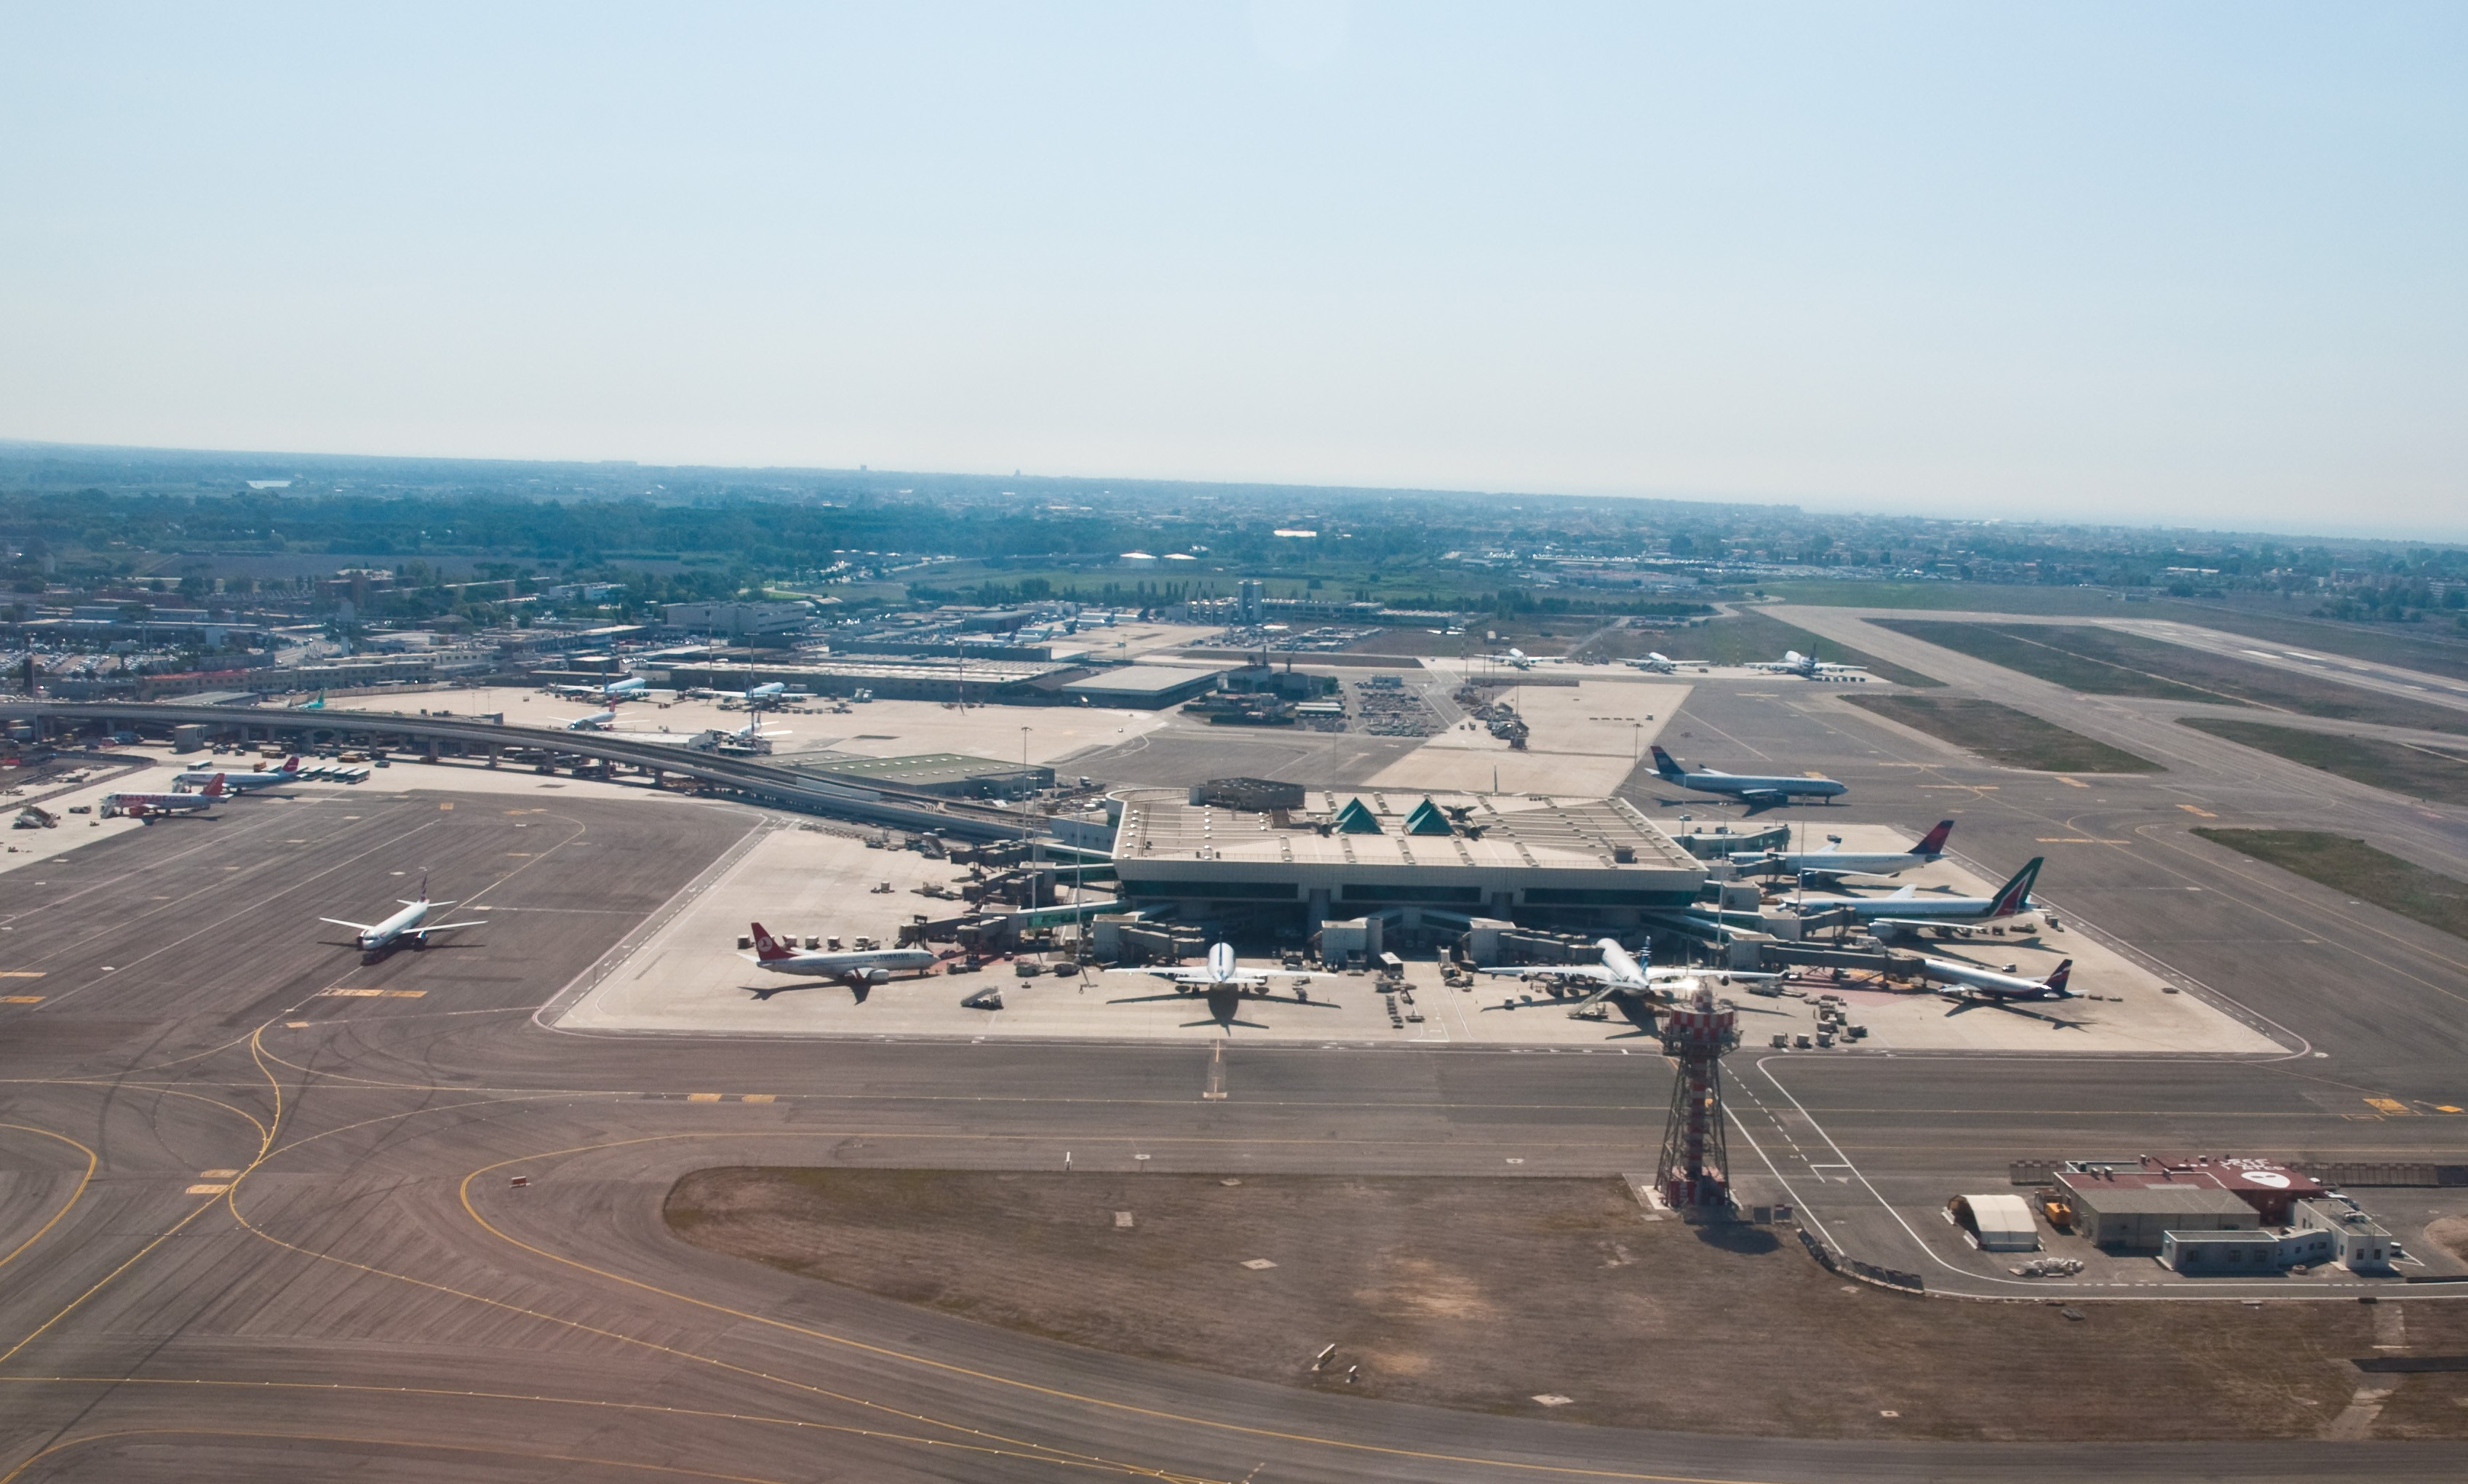 fiumcino airport